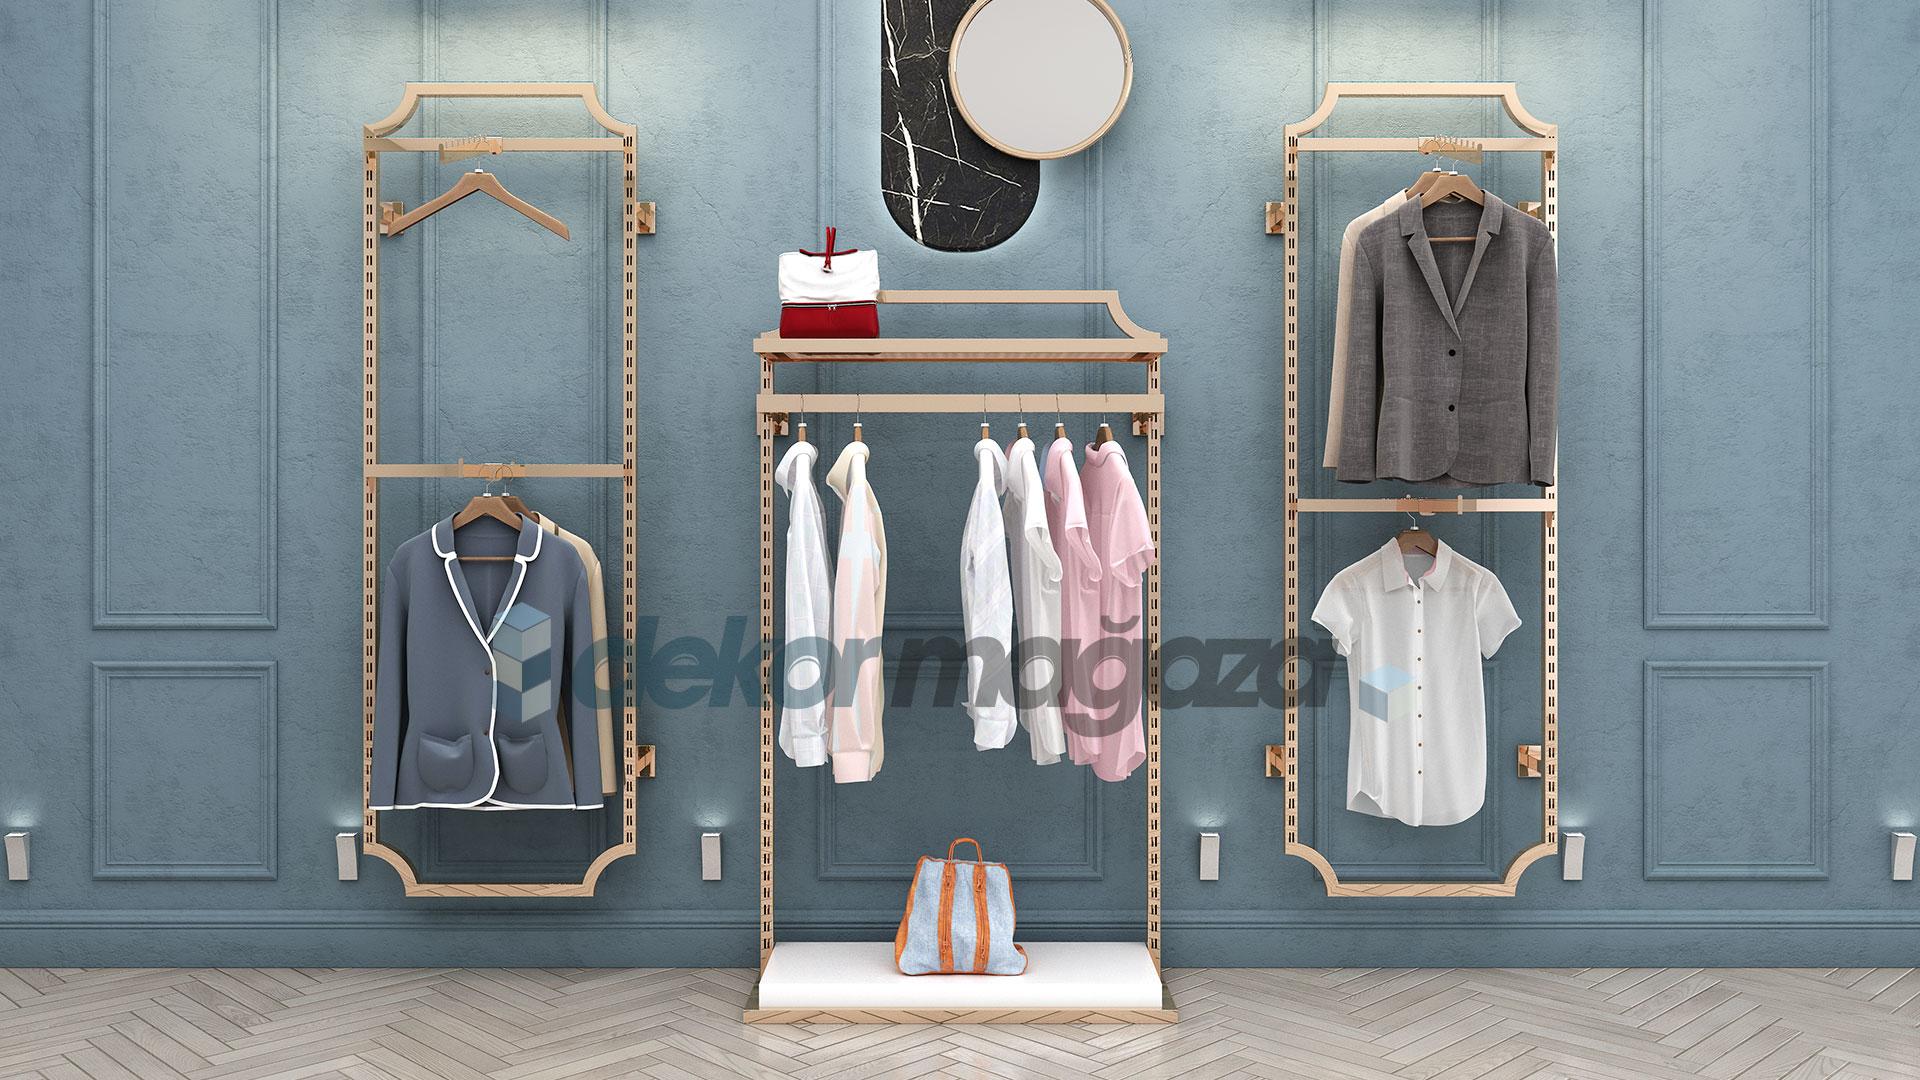 dekor-magaza-dekorasyon-magaza-raf-sistemleri-panos-032021-2-1